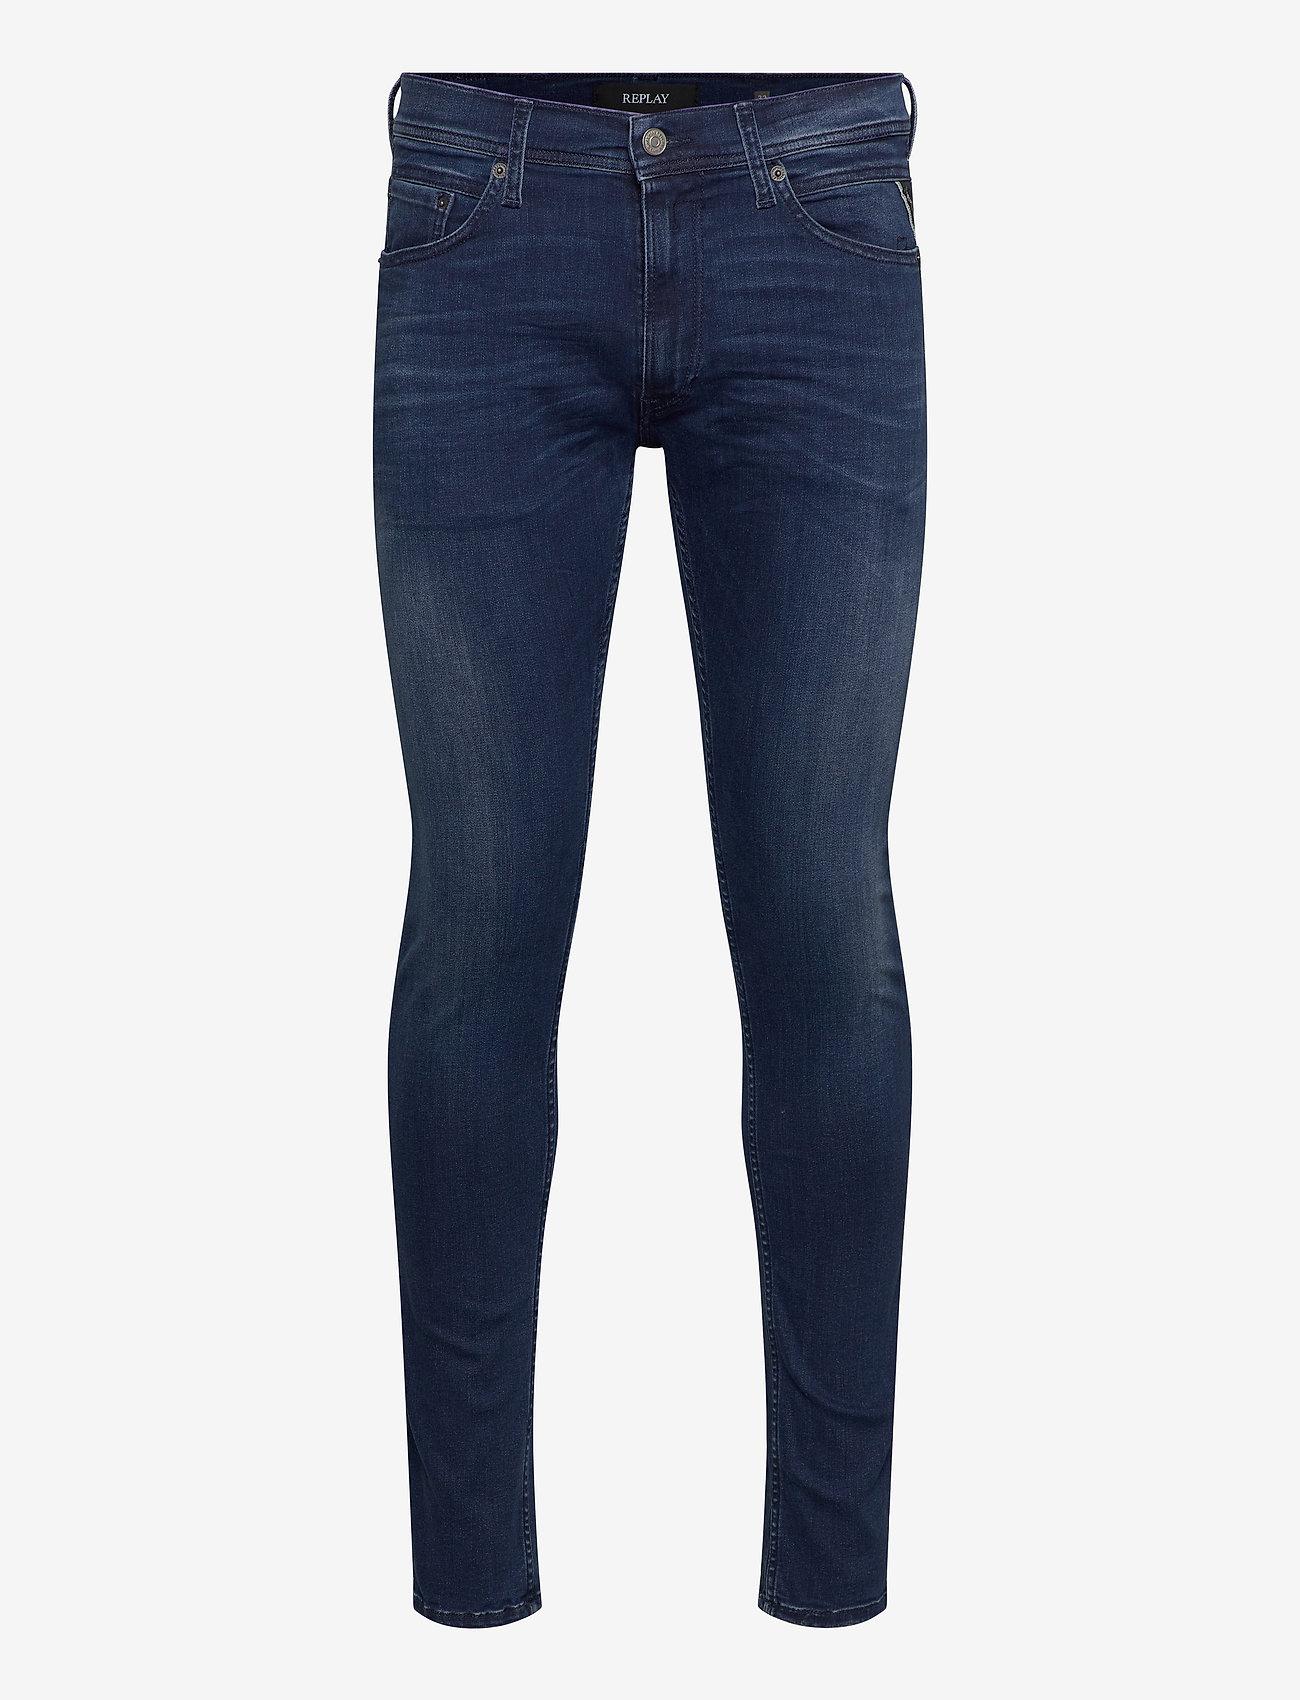 Replay - JONDRILL - skinny jeans - medium blue - 0